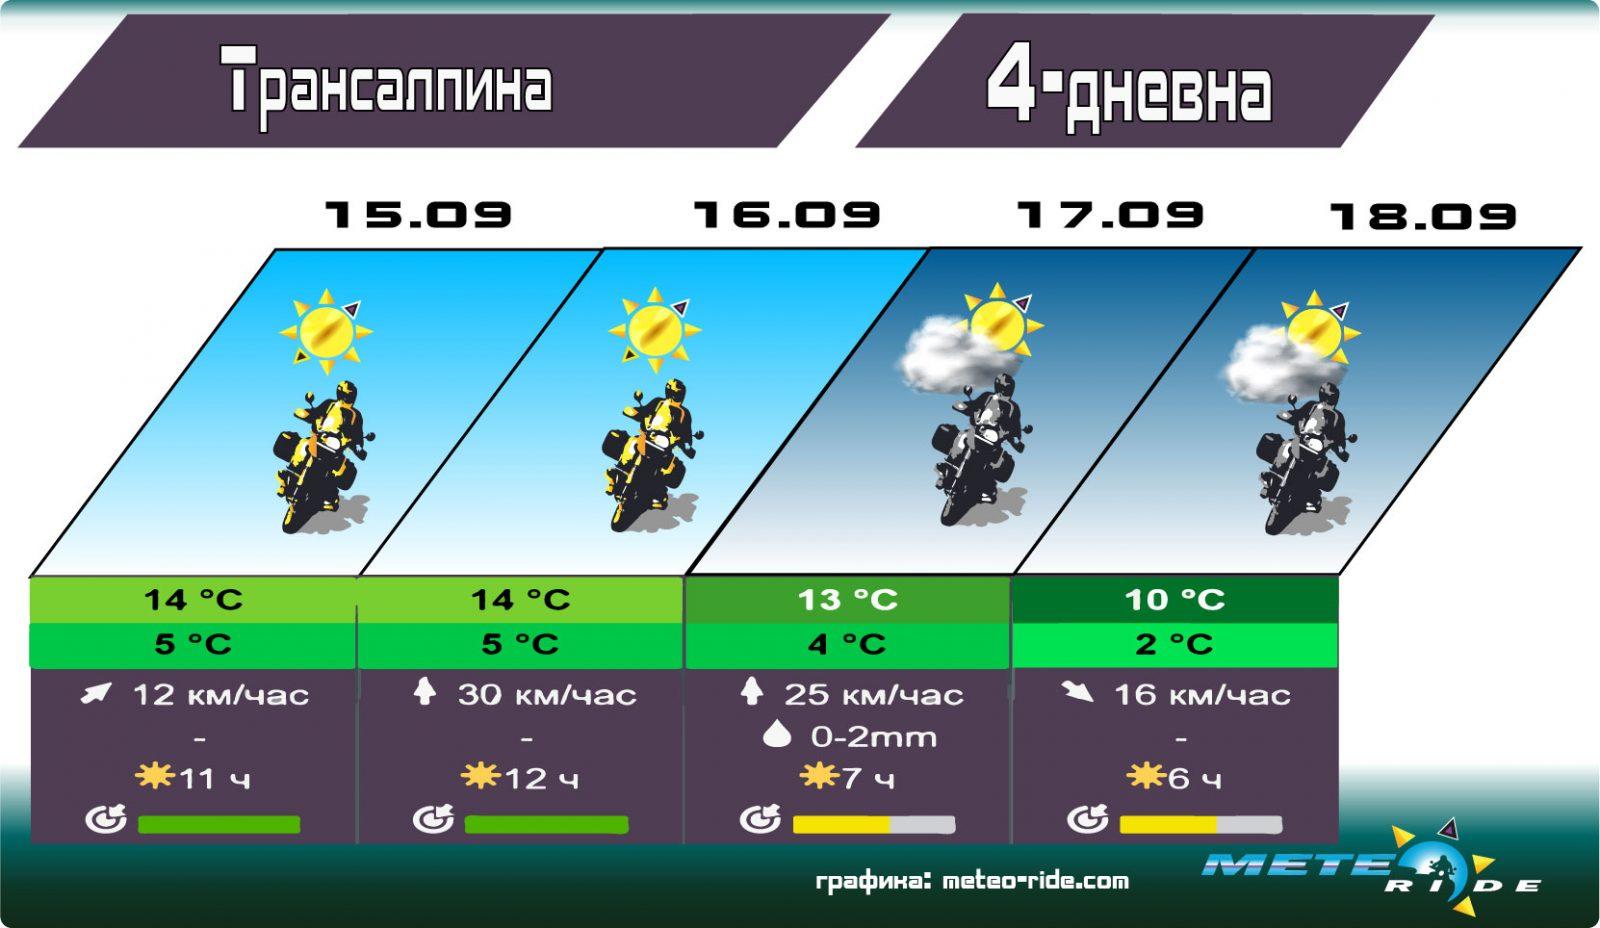 Слънчево и топло над 2000 м. в Карпатите този уикенд. Последен шанс за Трансалпина и Трансфагарашан